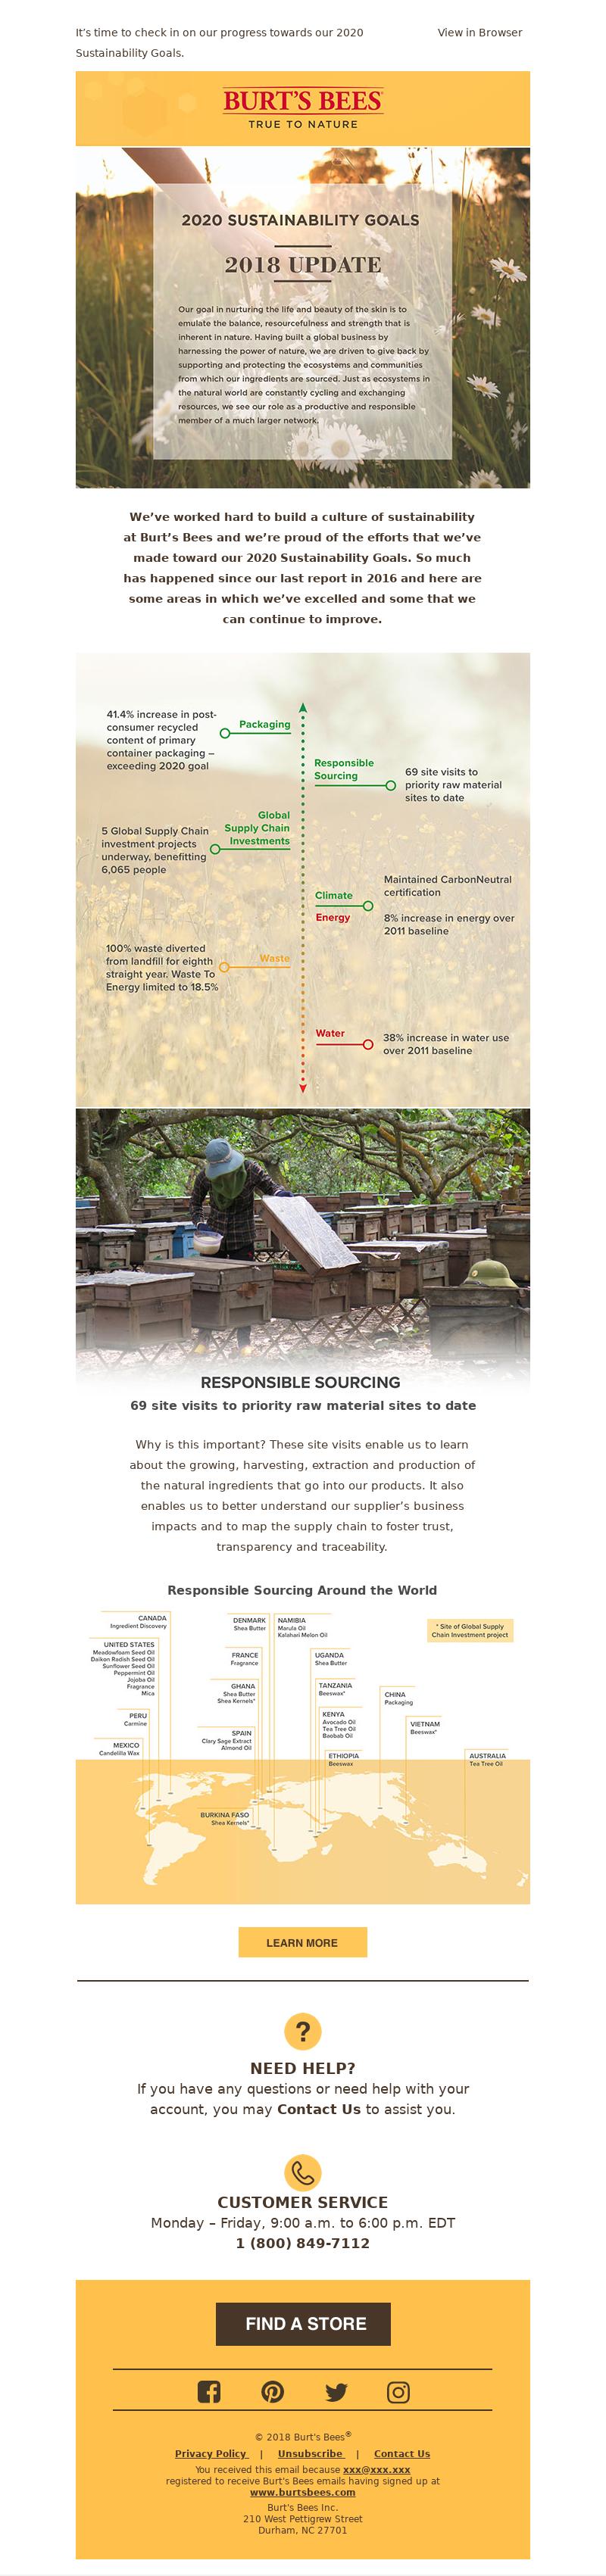 Burt's Bees - Progress Report: Our 2020 Sustainability Goals